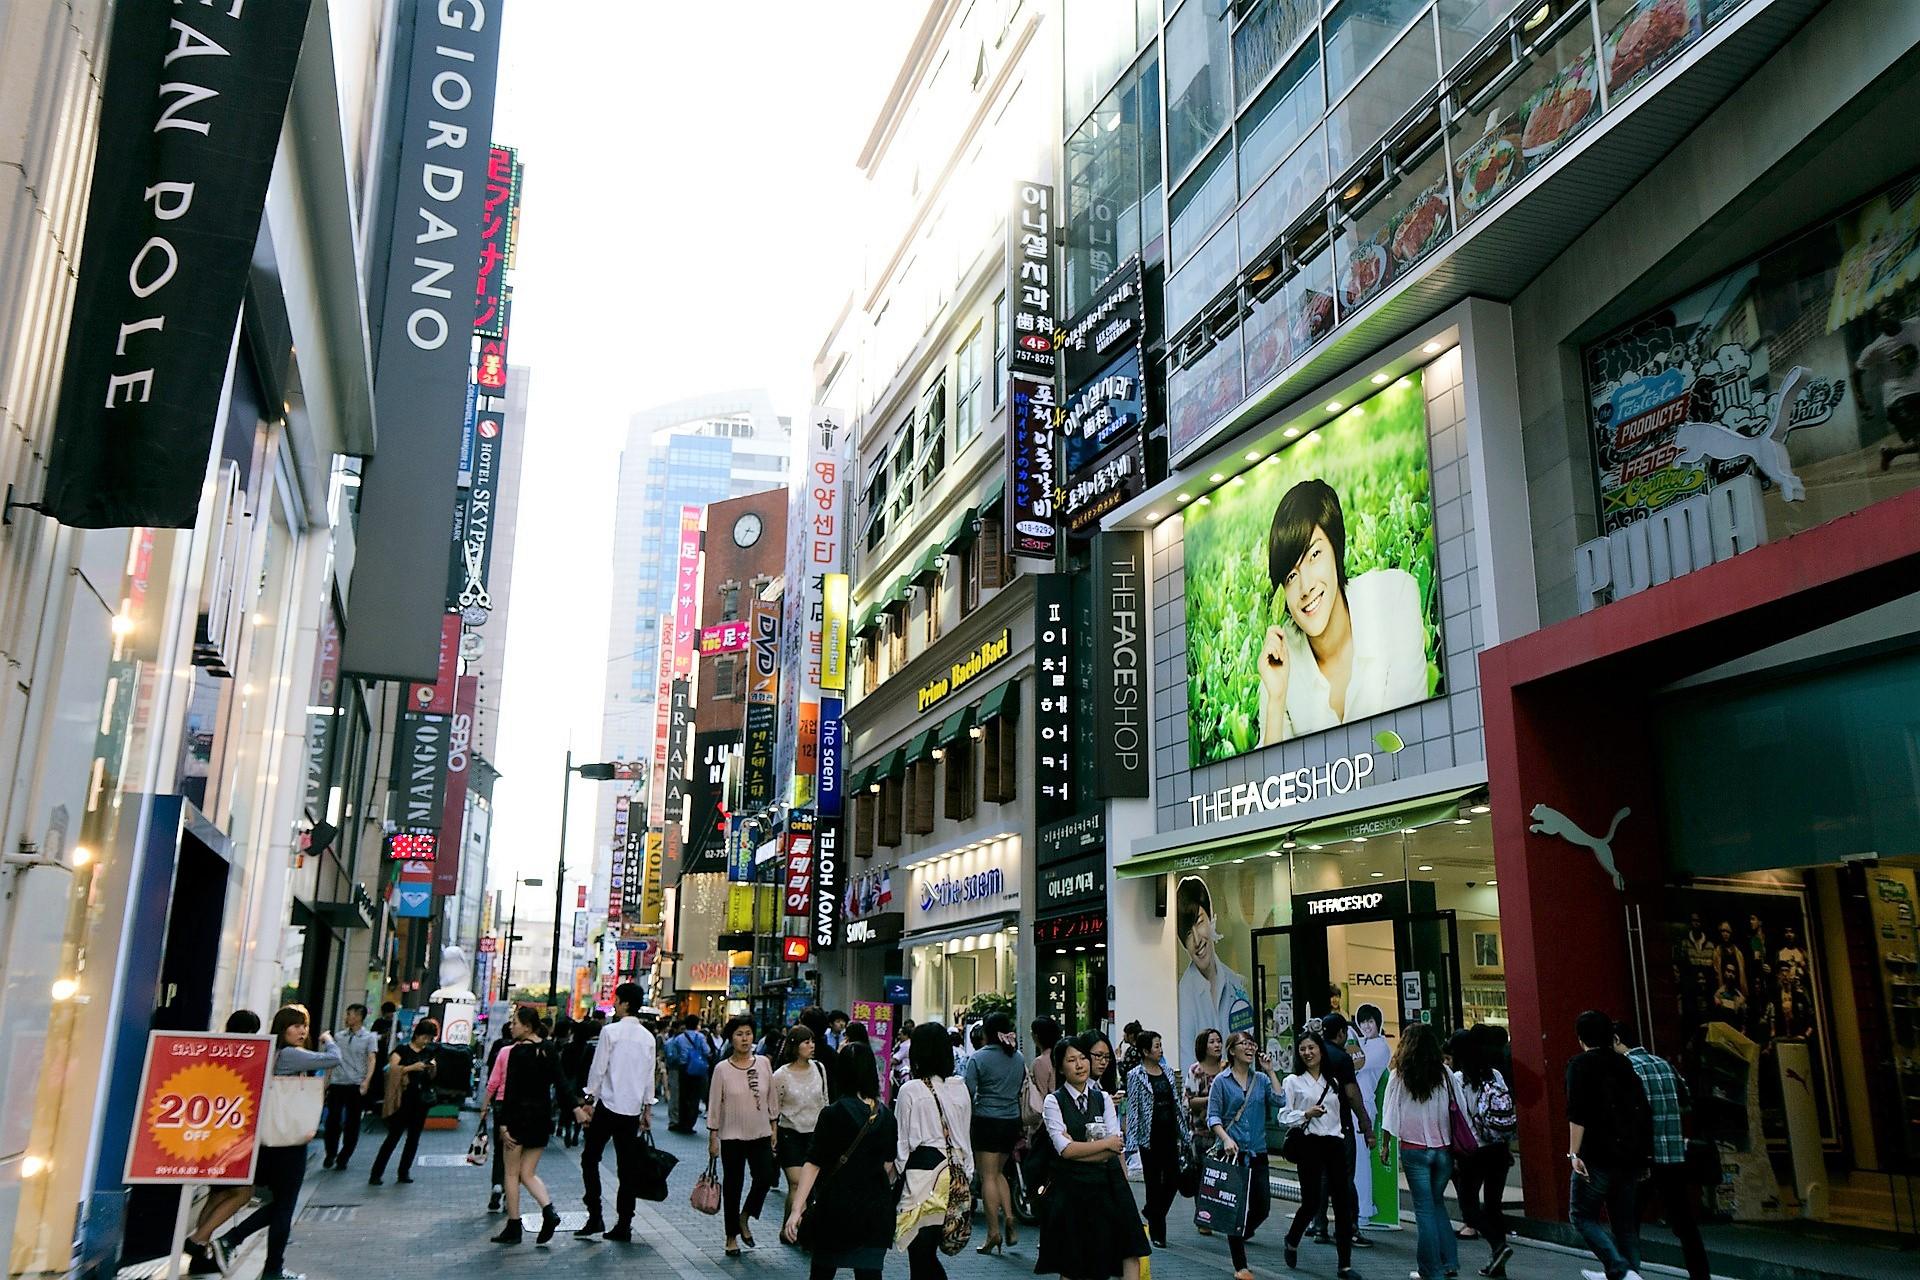 9D8N South Korea itinerary for Seoul, Jeju Island and Busan